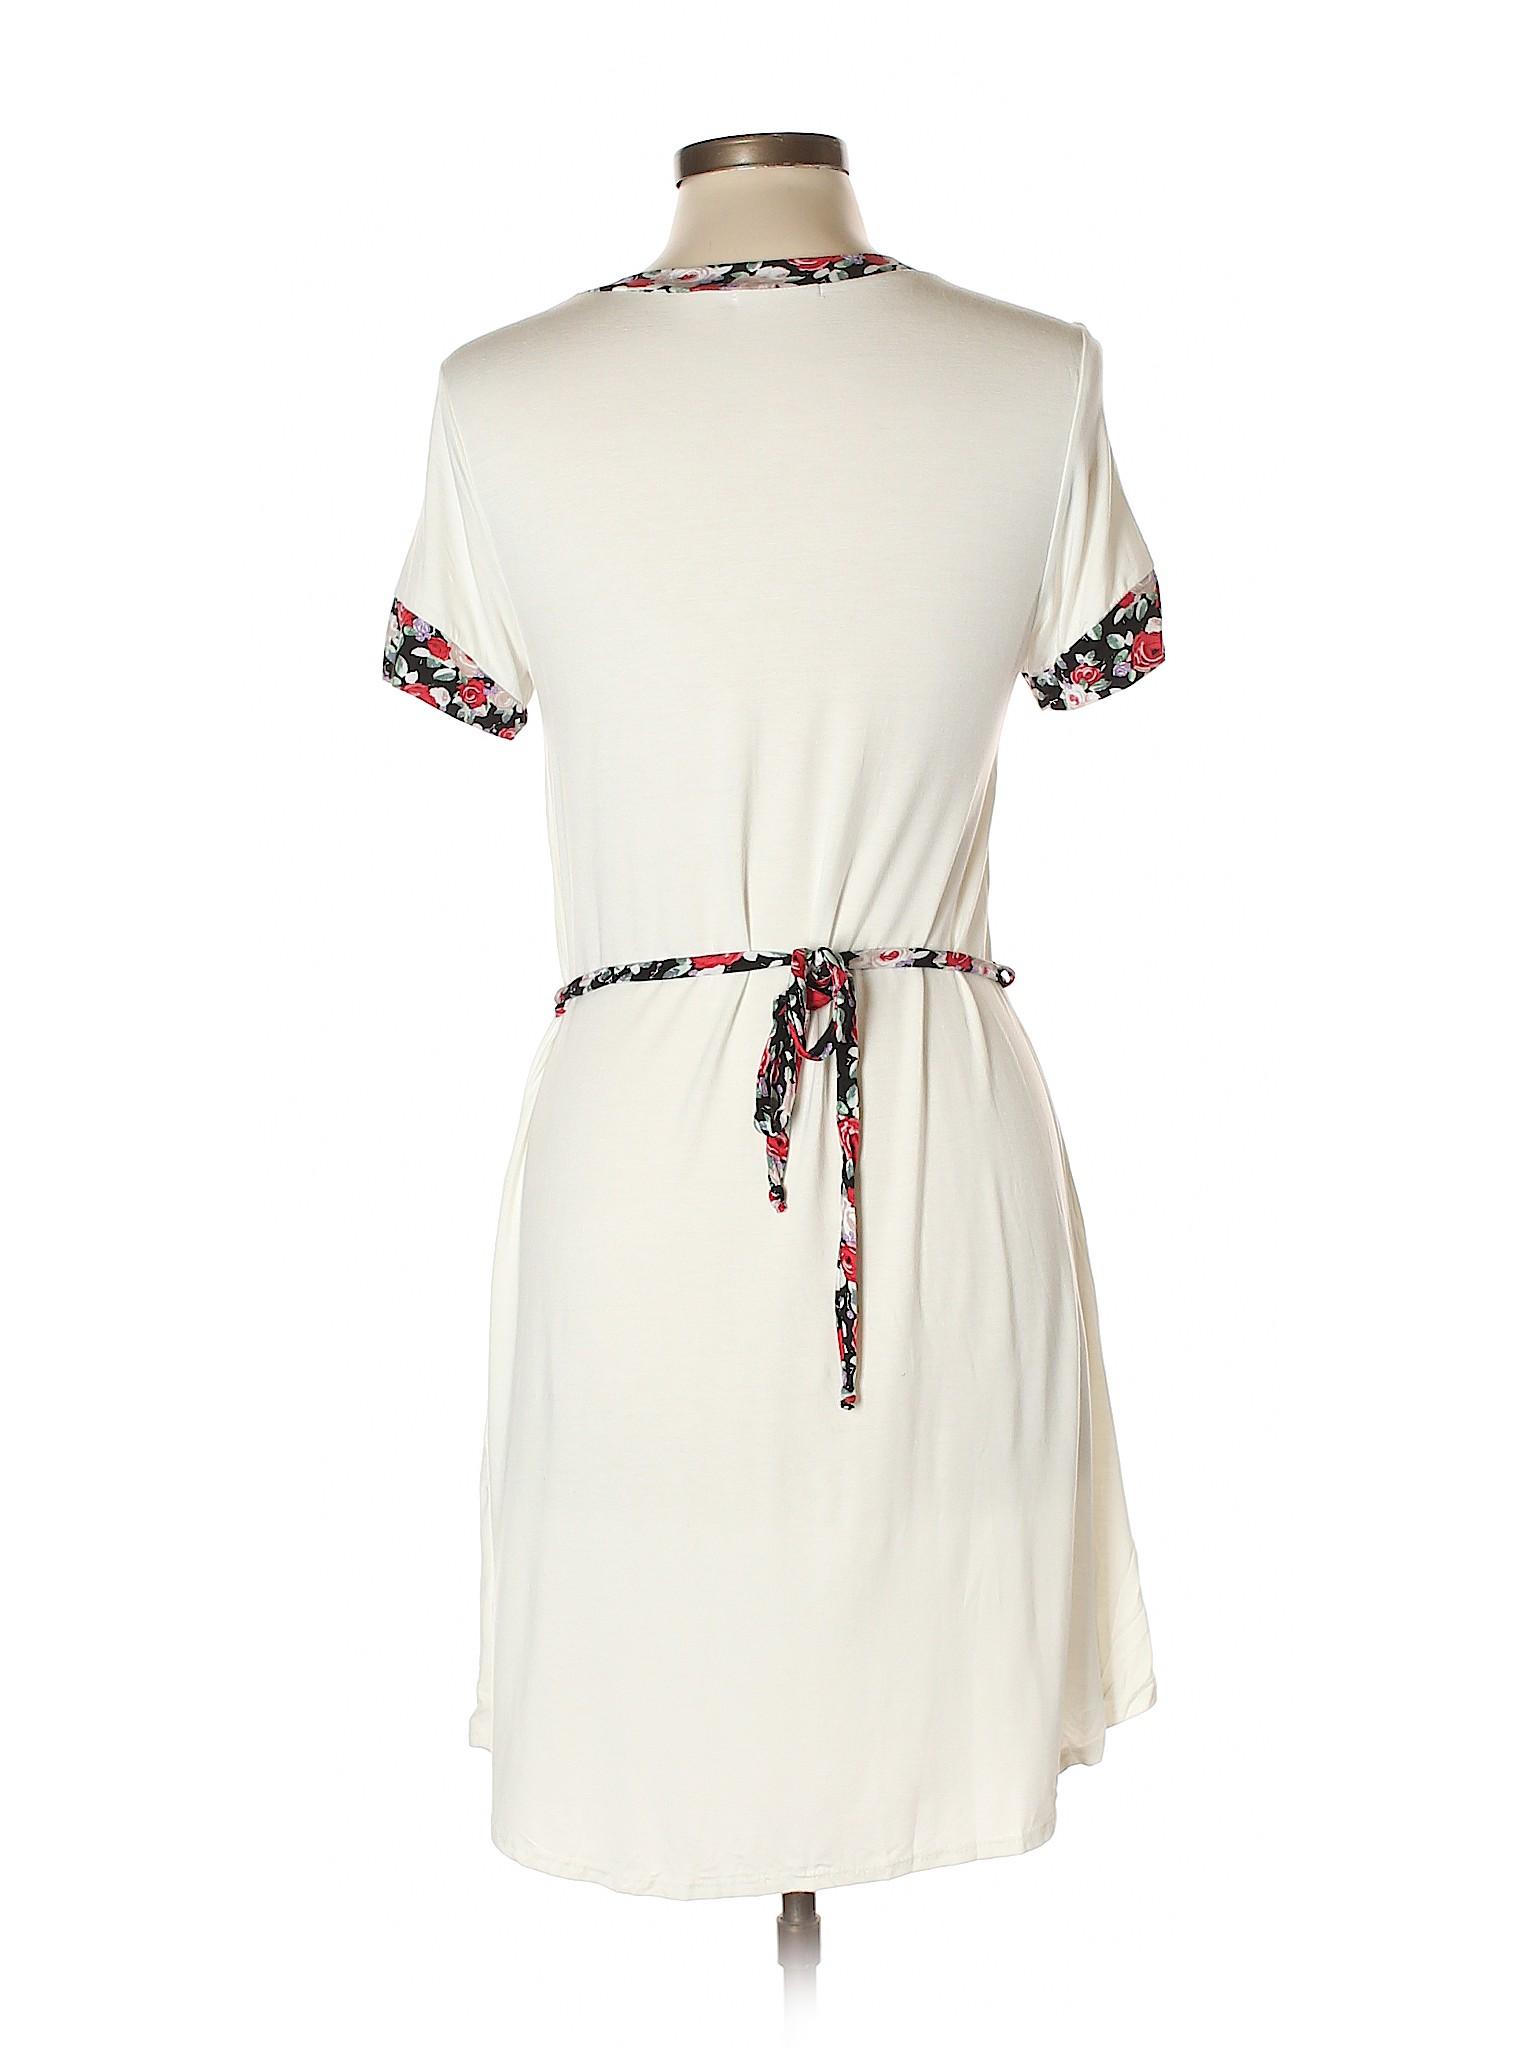 Boutique Ami by winter Dress 12pm Mon Casual pqrpzTxw